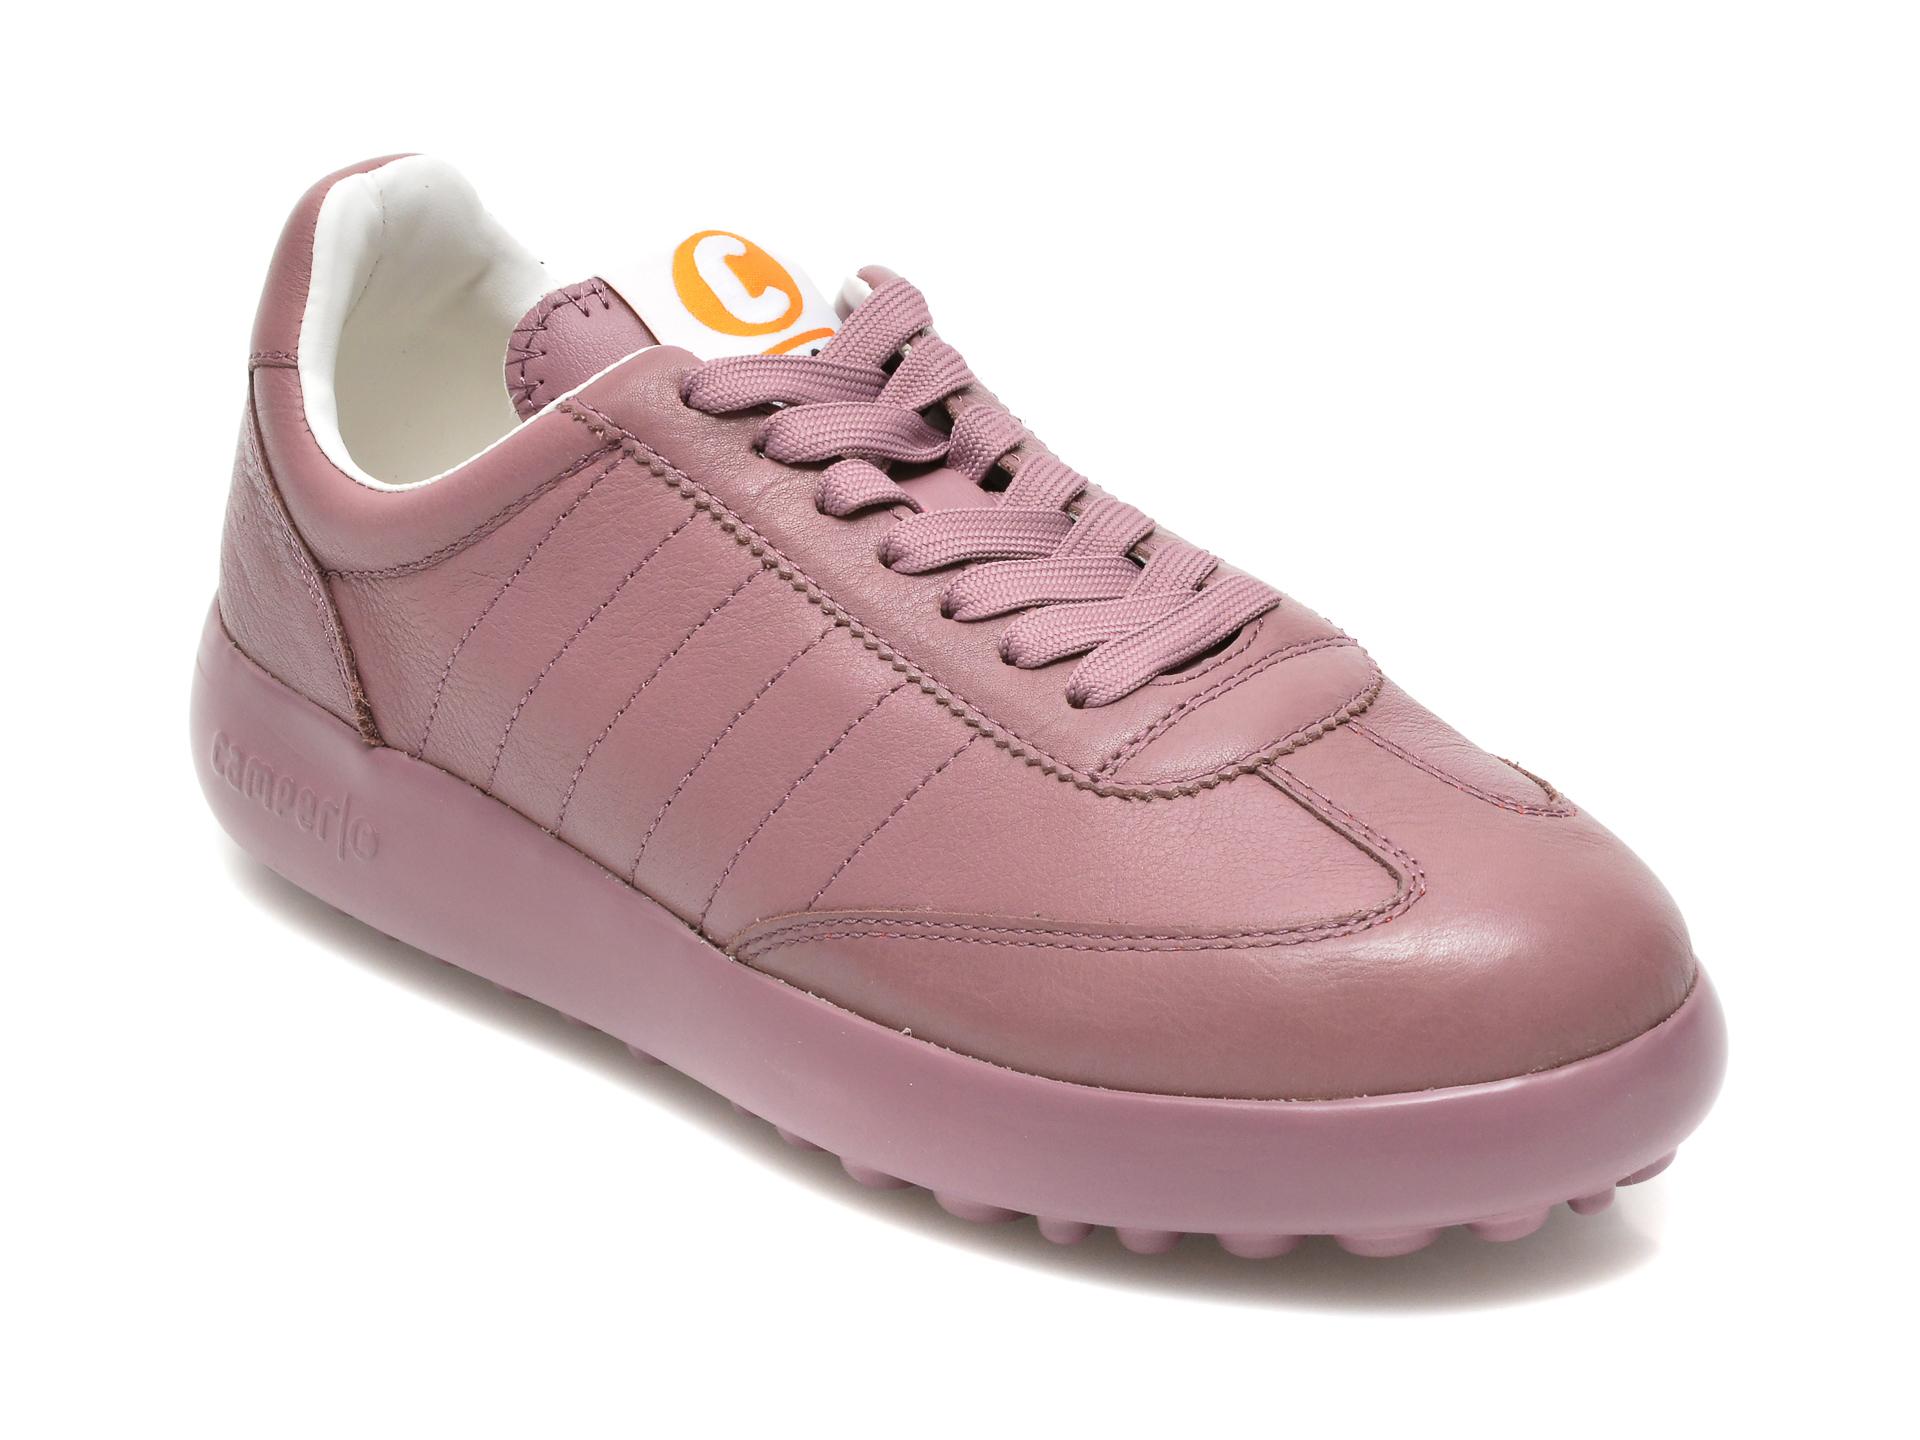 Pantofi Camper Mov, K201060, Din Piele Naturala